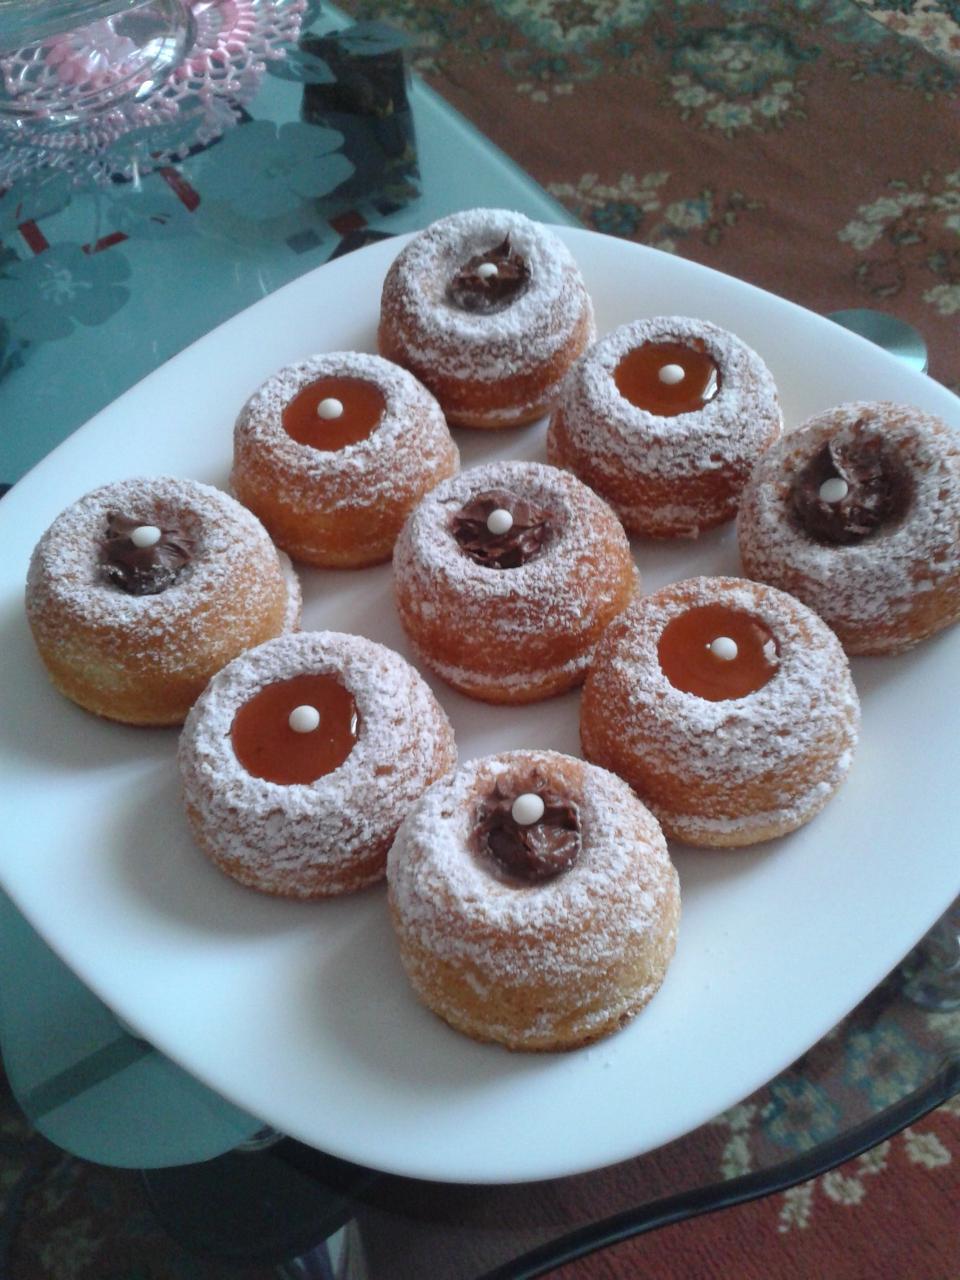 صورة حلويات ام انس , اشهي اطباق حلويات من ام انس 3542 7